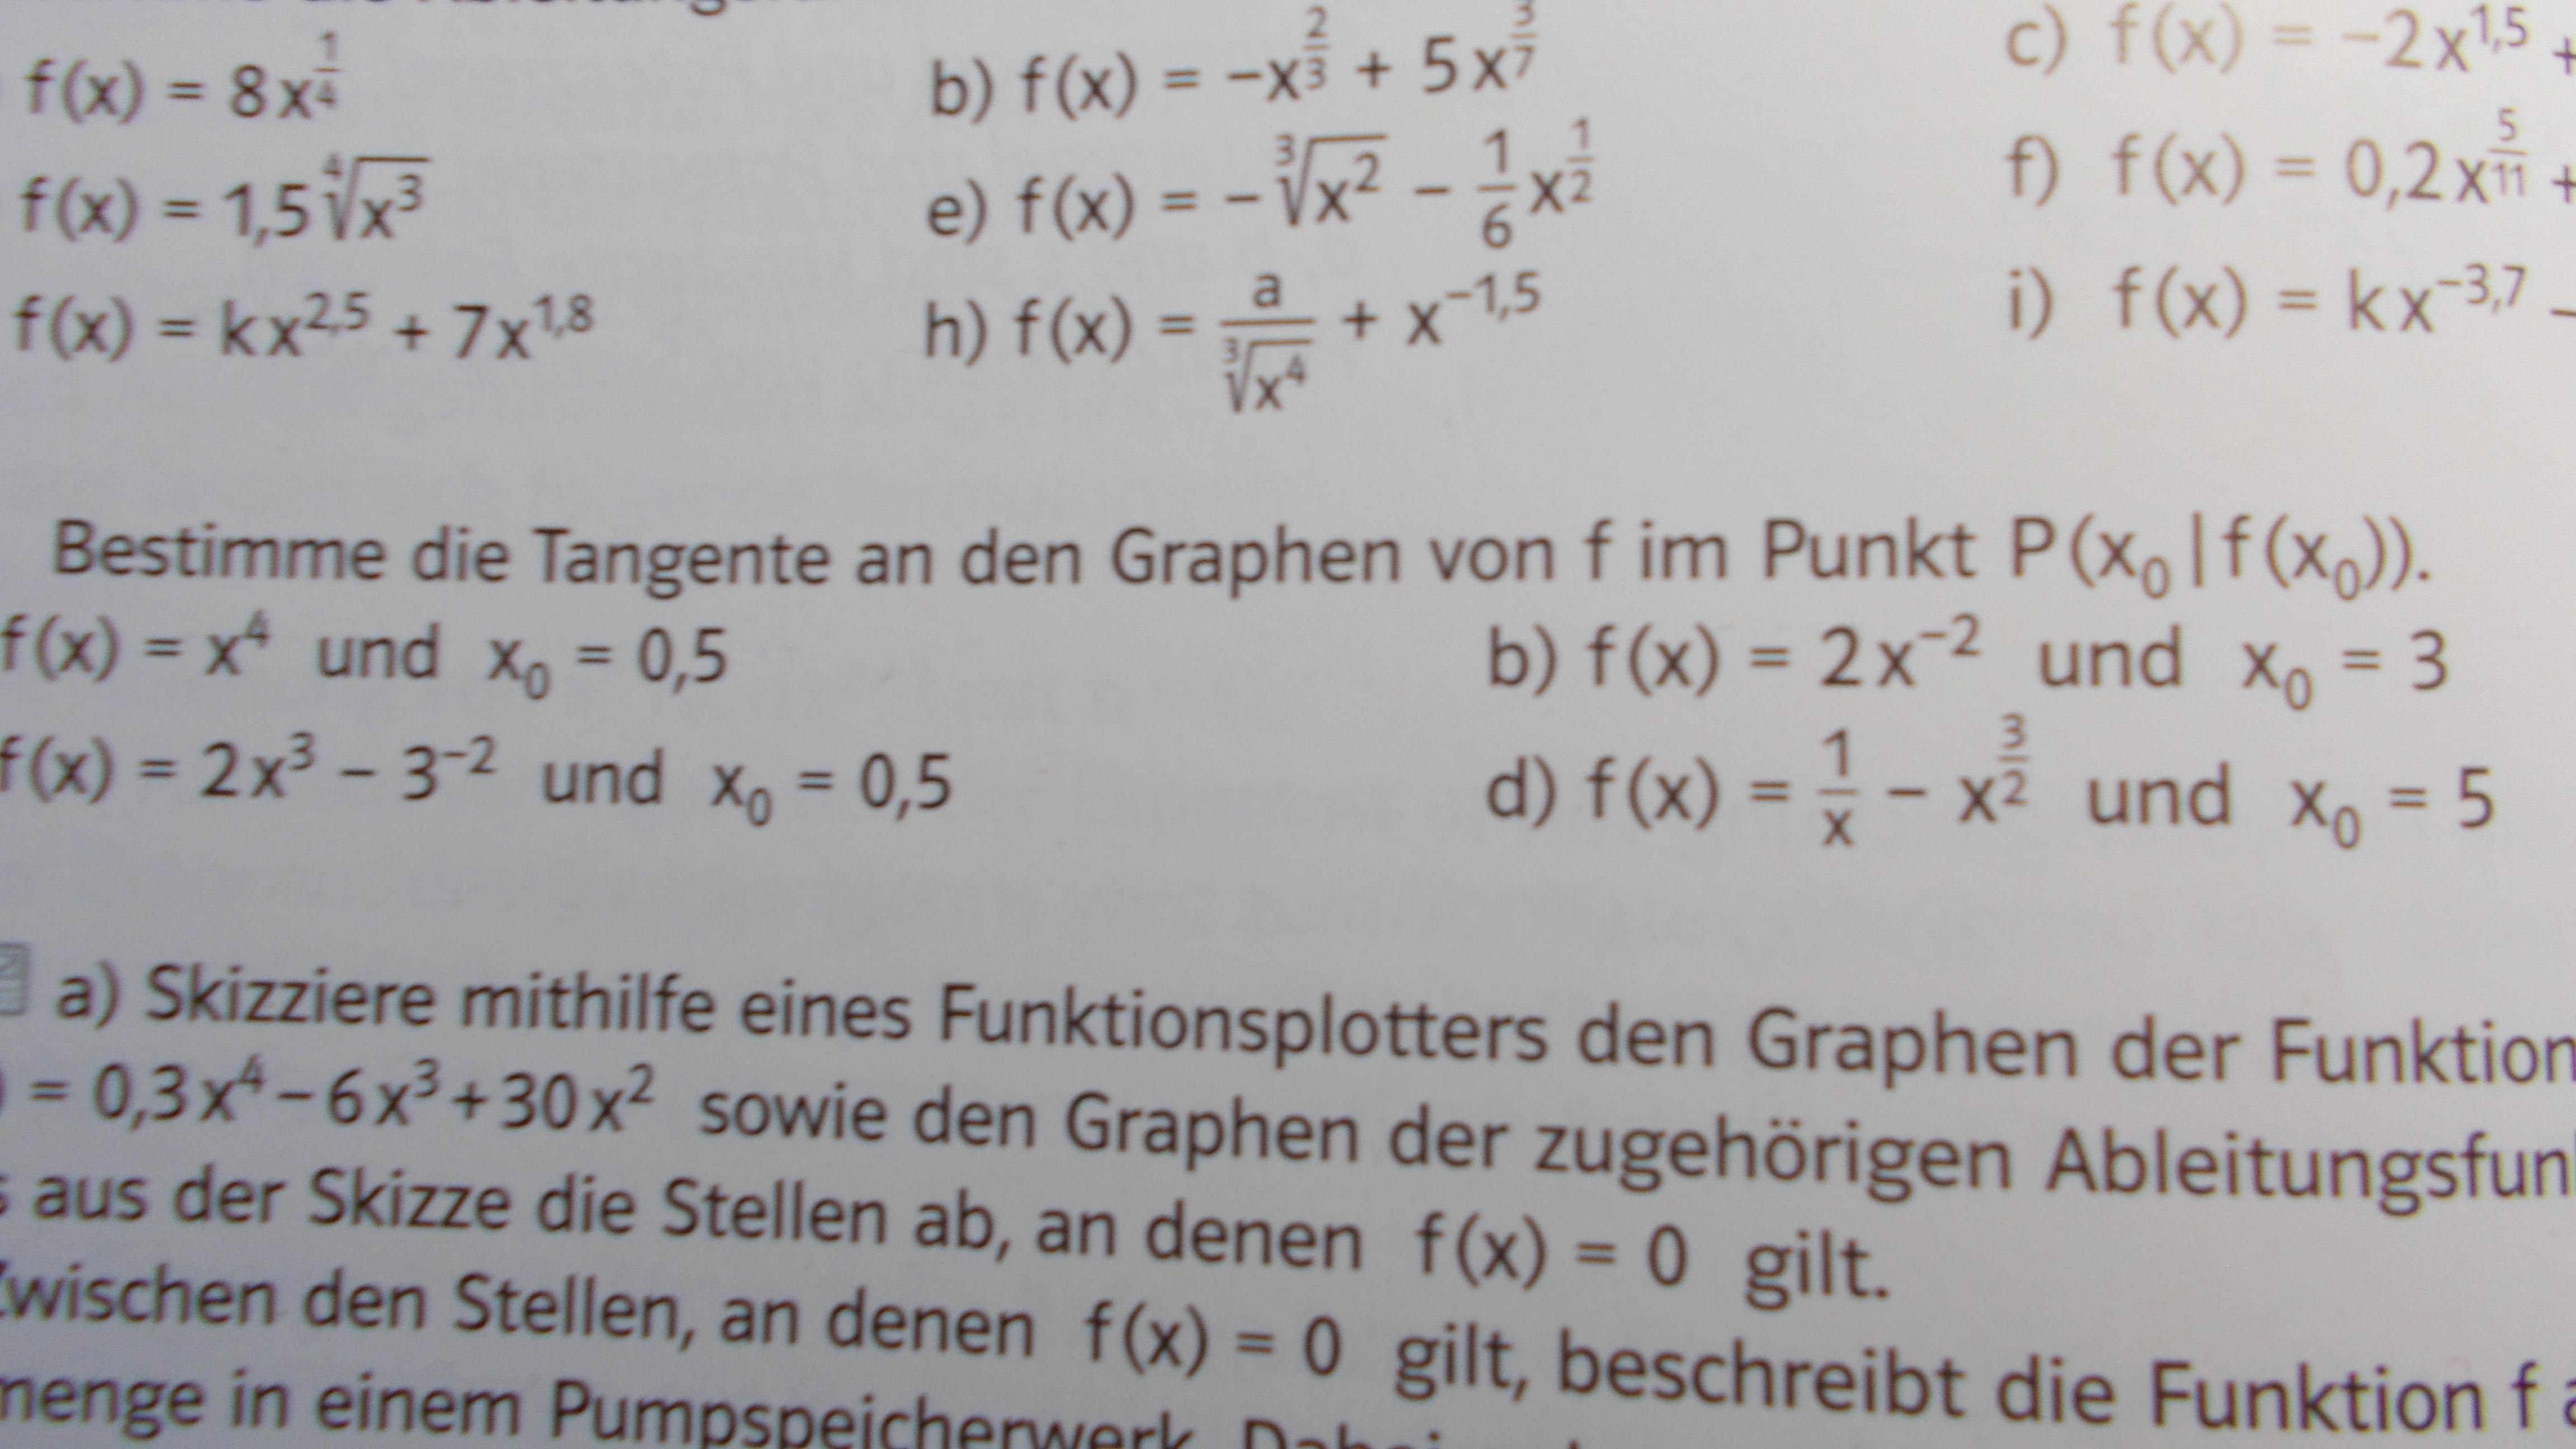 Groß Math 10 Arbeitsblatt Fotos - Übungen Mathe - canhogemriverside.info